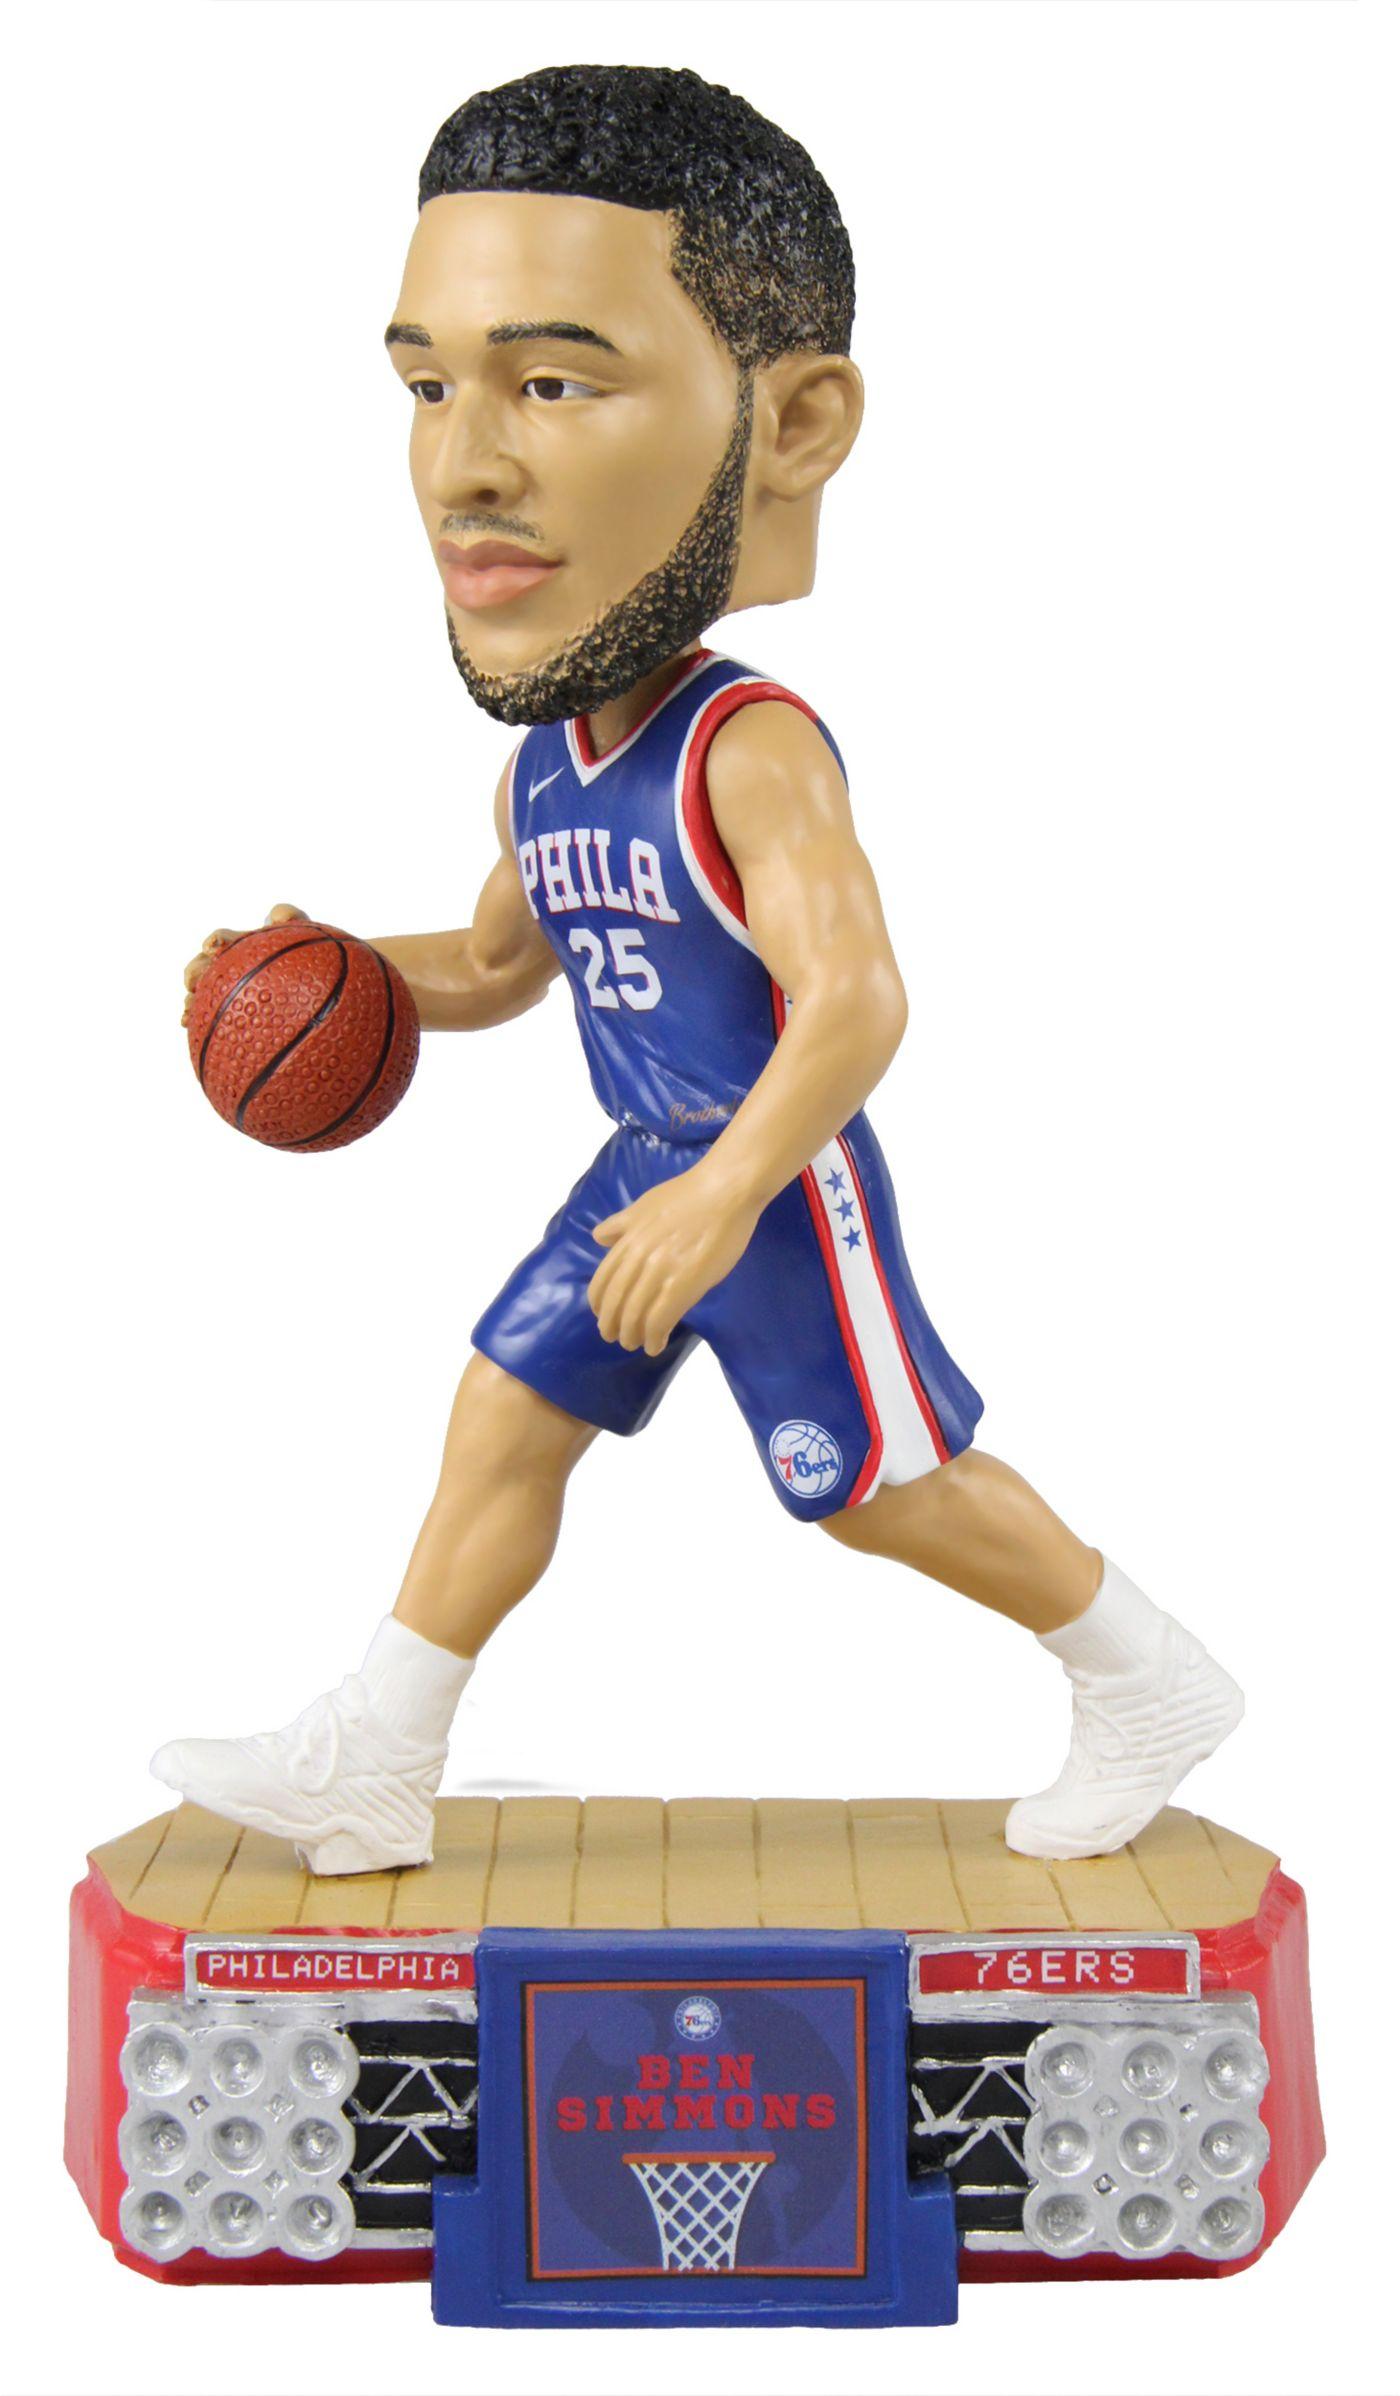 FOCO Philadelphia 76ers Ben Simmons Bobblehead